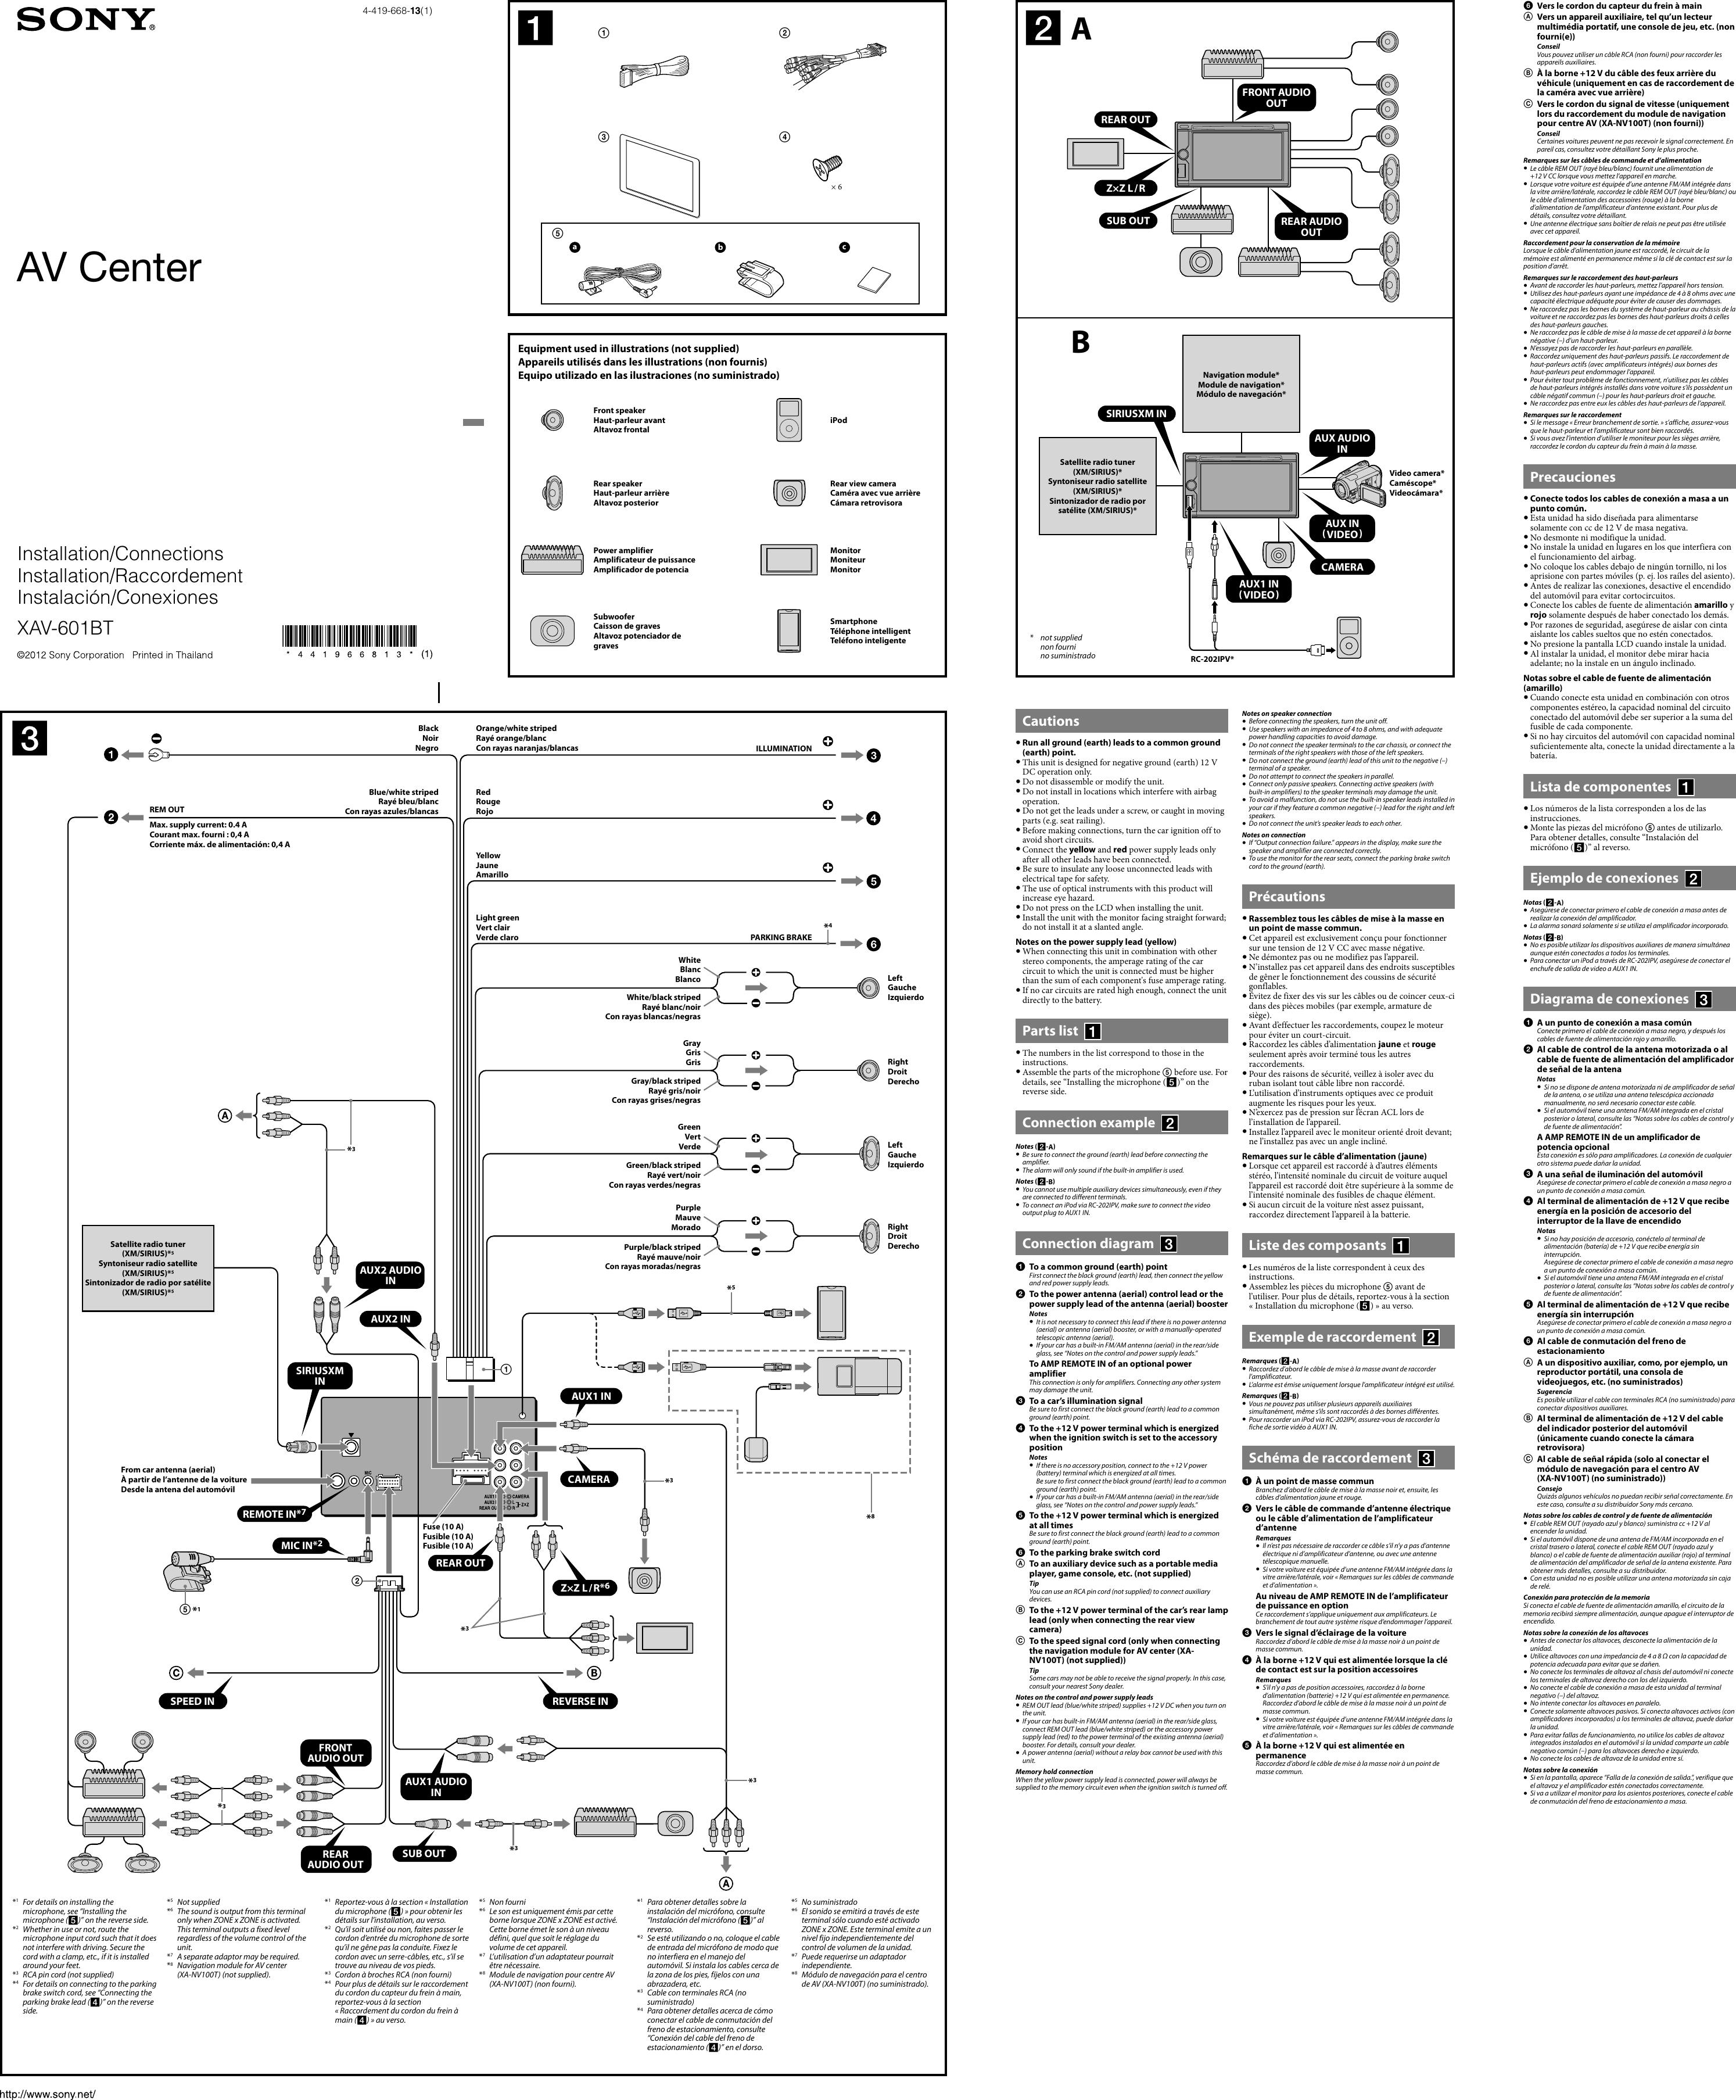 Sony Xav 601bt Installation Connections Manual Wiring Harness